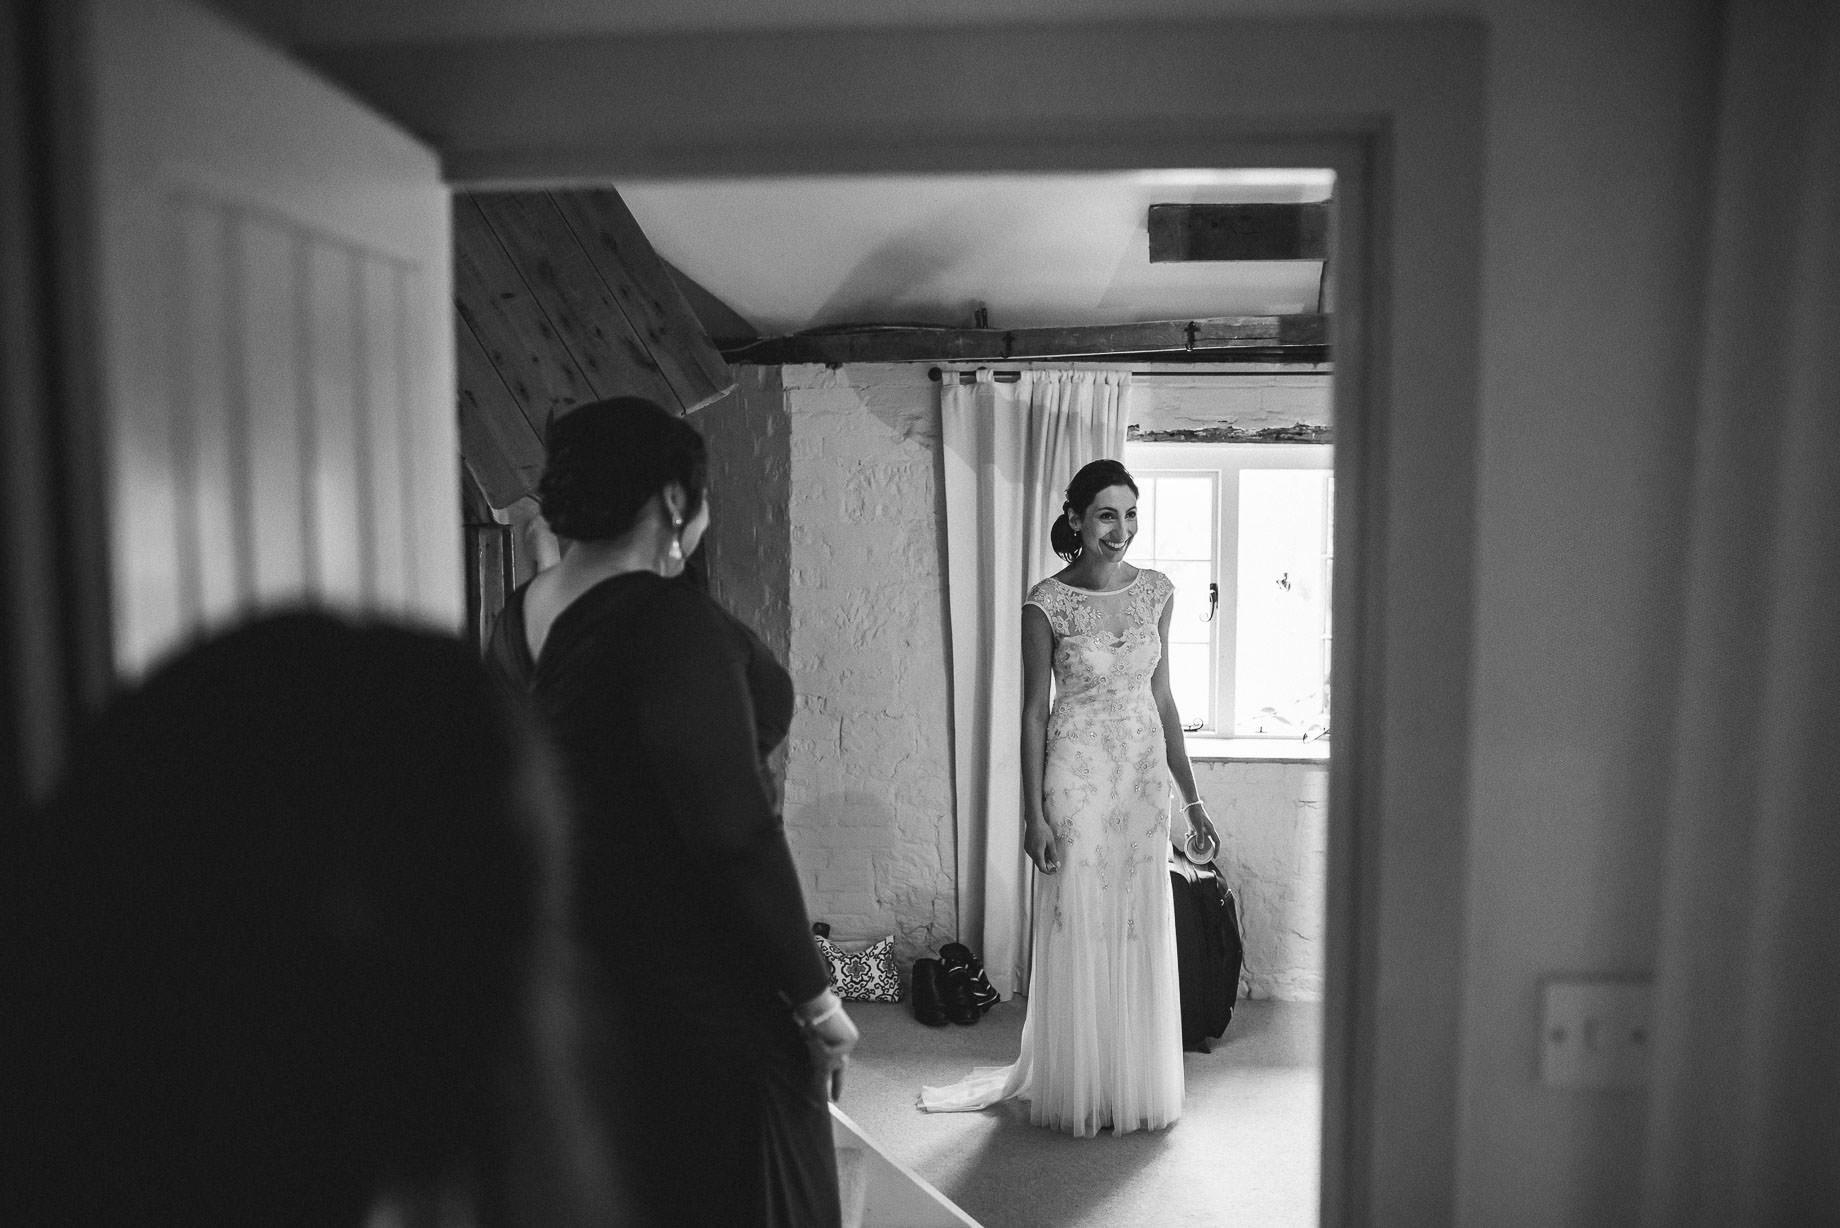 bury-court-barn-wedding-photography-guy-collier-photography-nadia-tom-31-of-184